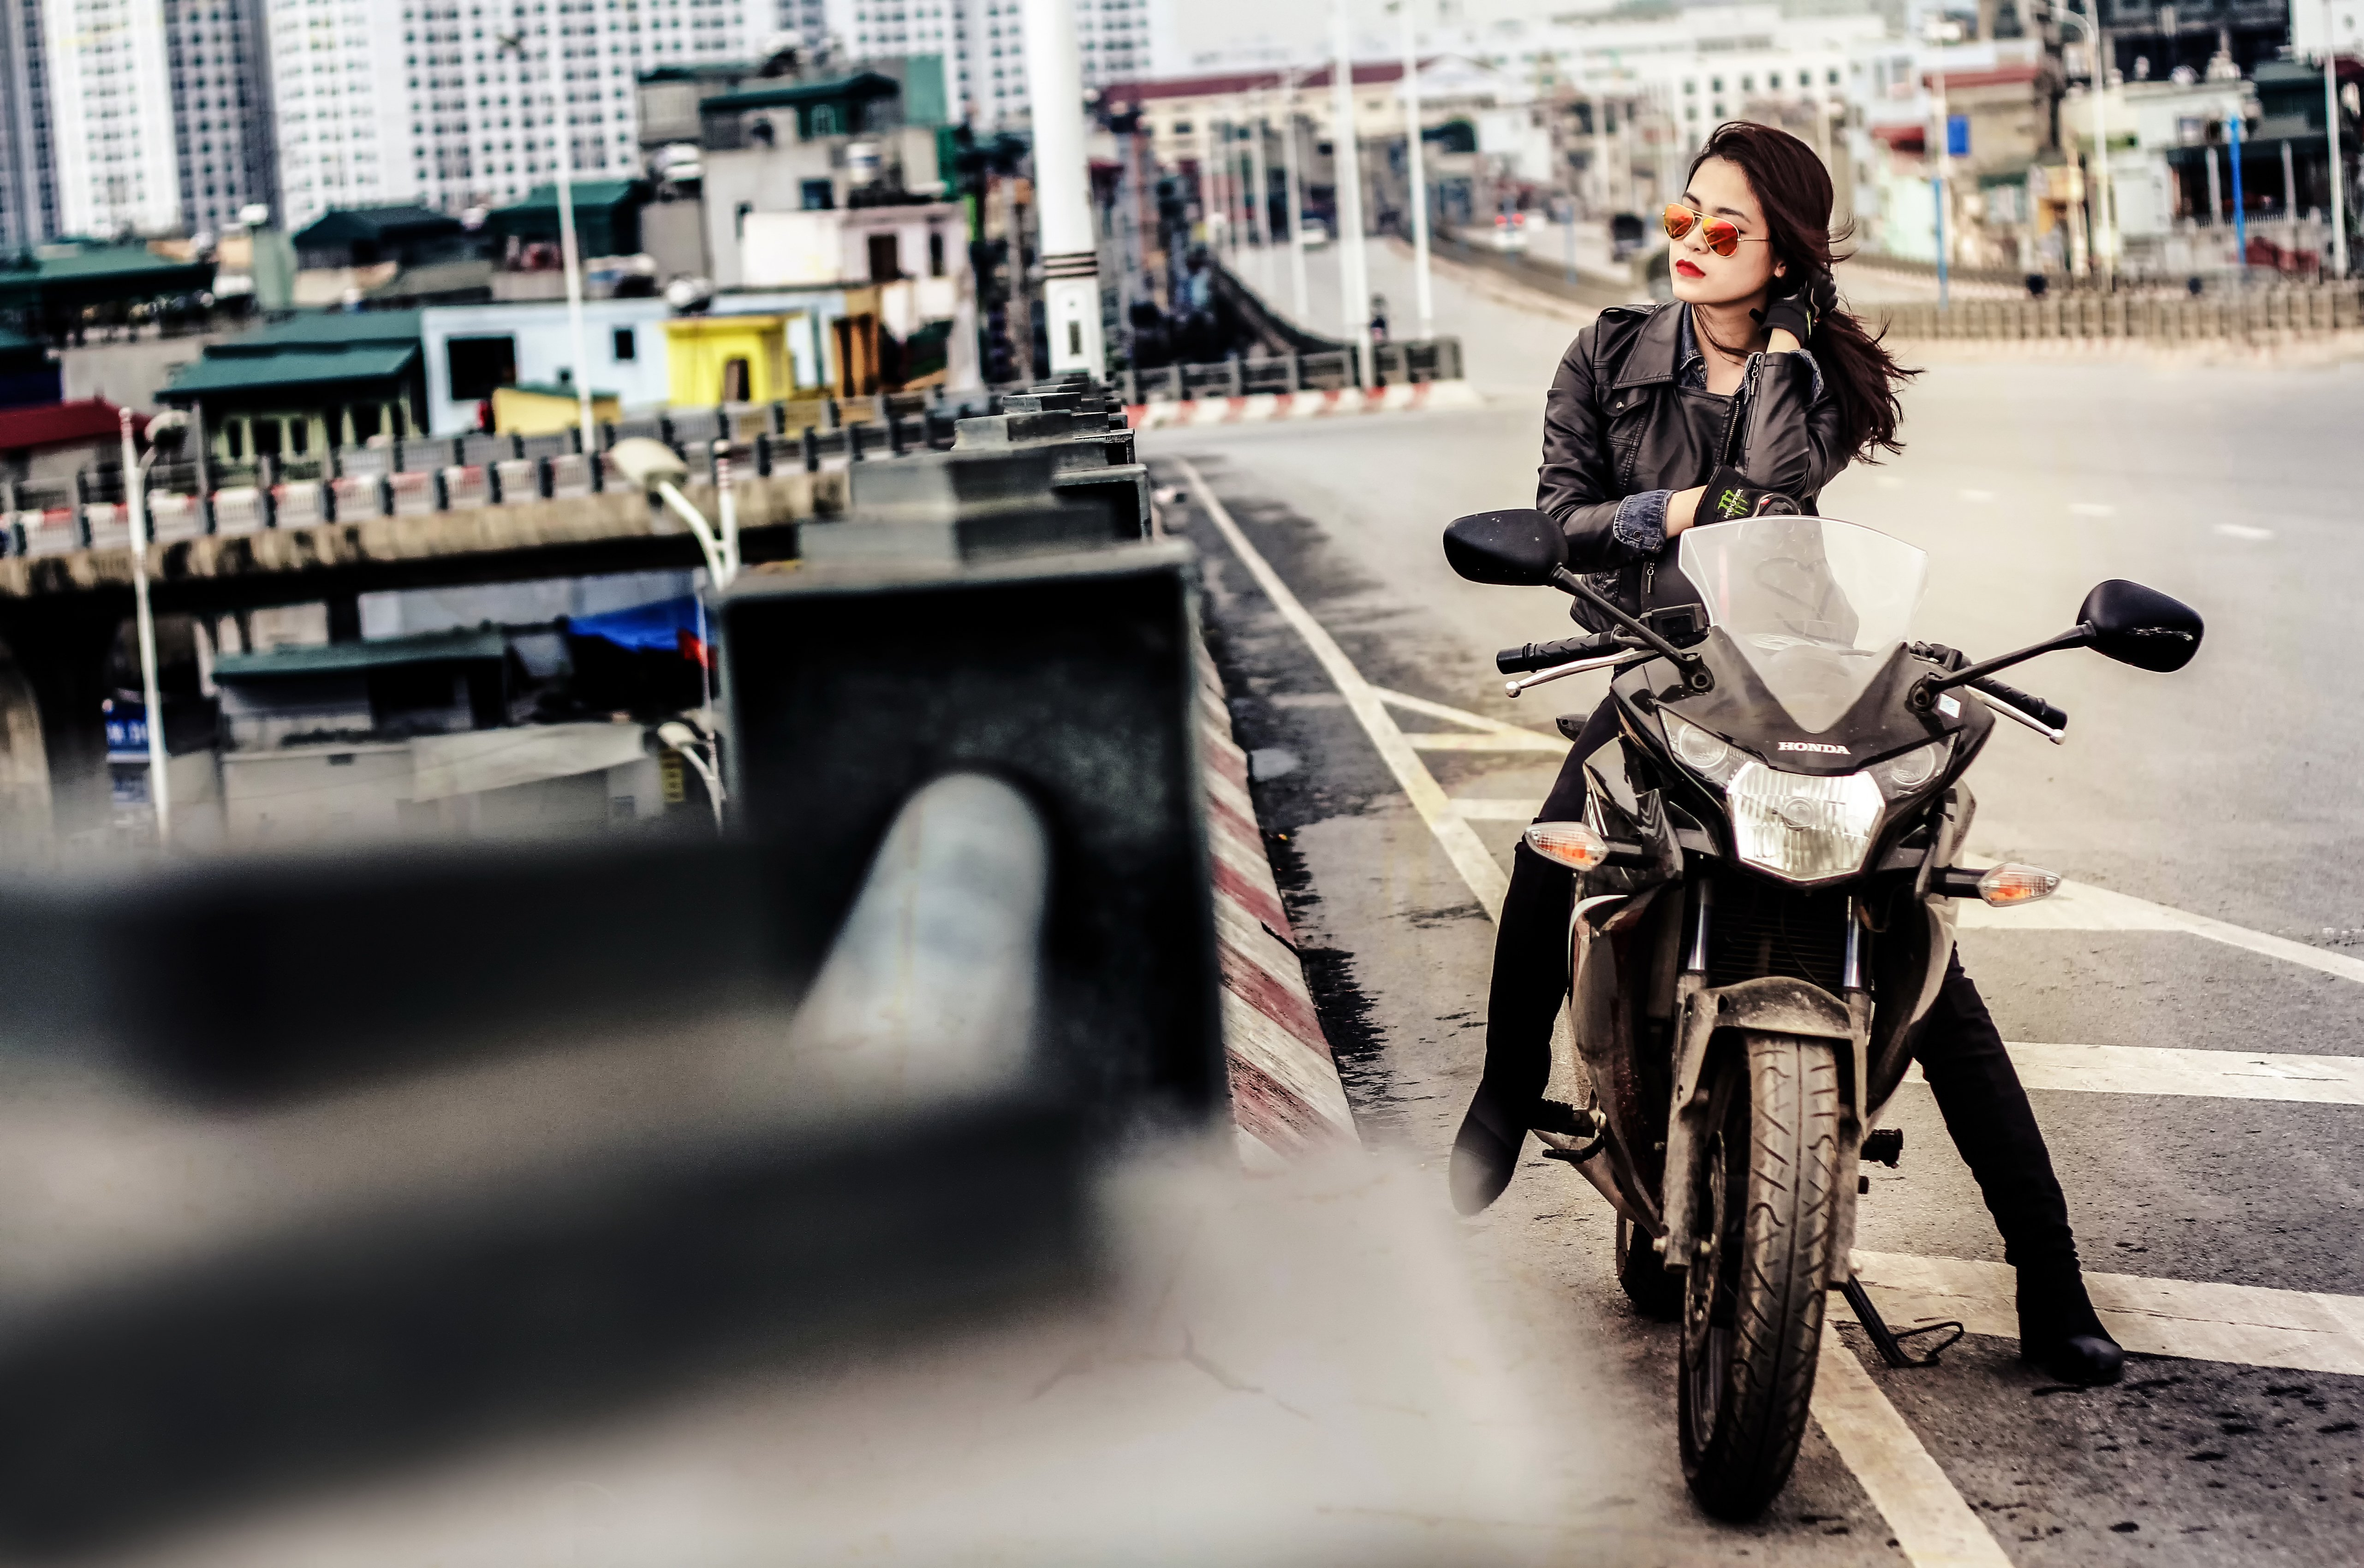 Фото брюнетки на мотоцикле 15 фотография